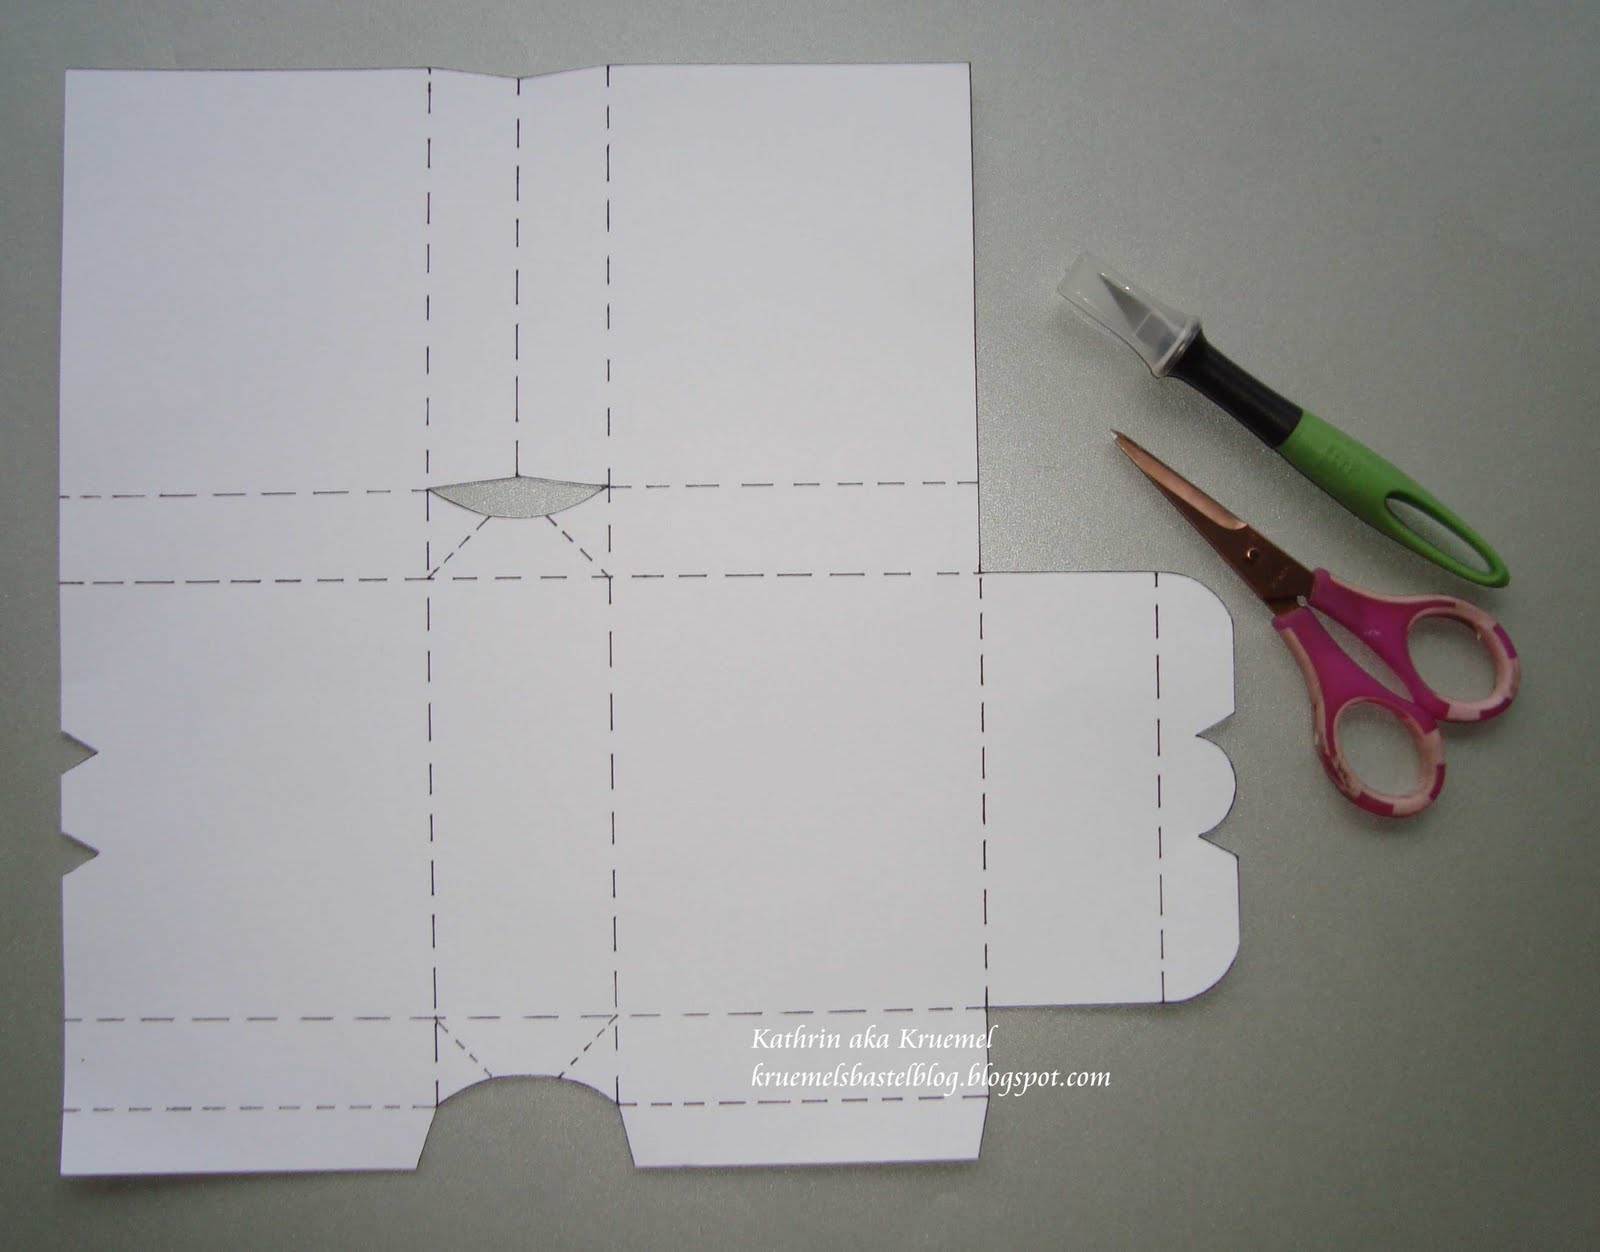 Bestecktaschen Papier Diy Bestecktasche Papierprojekt Blog